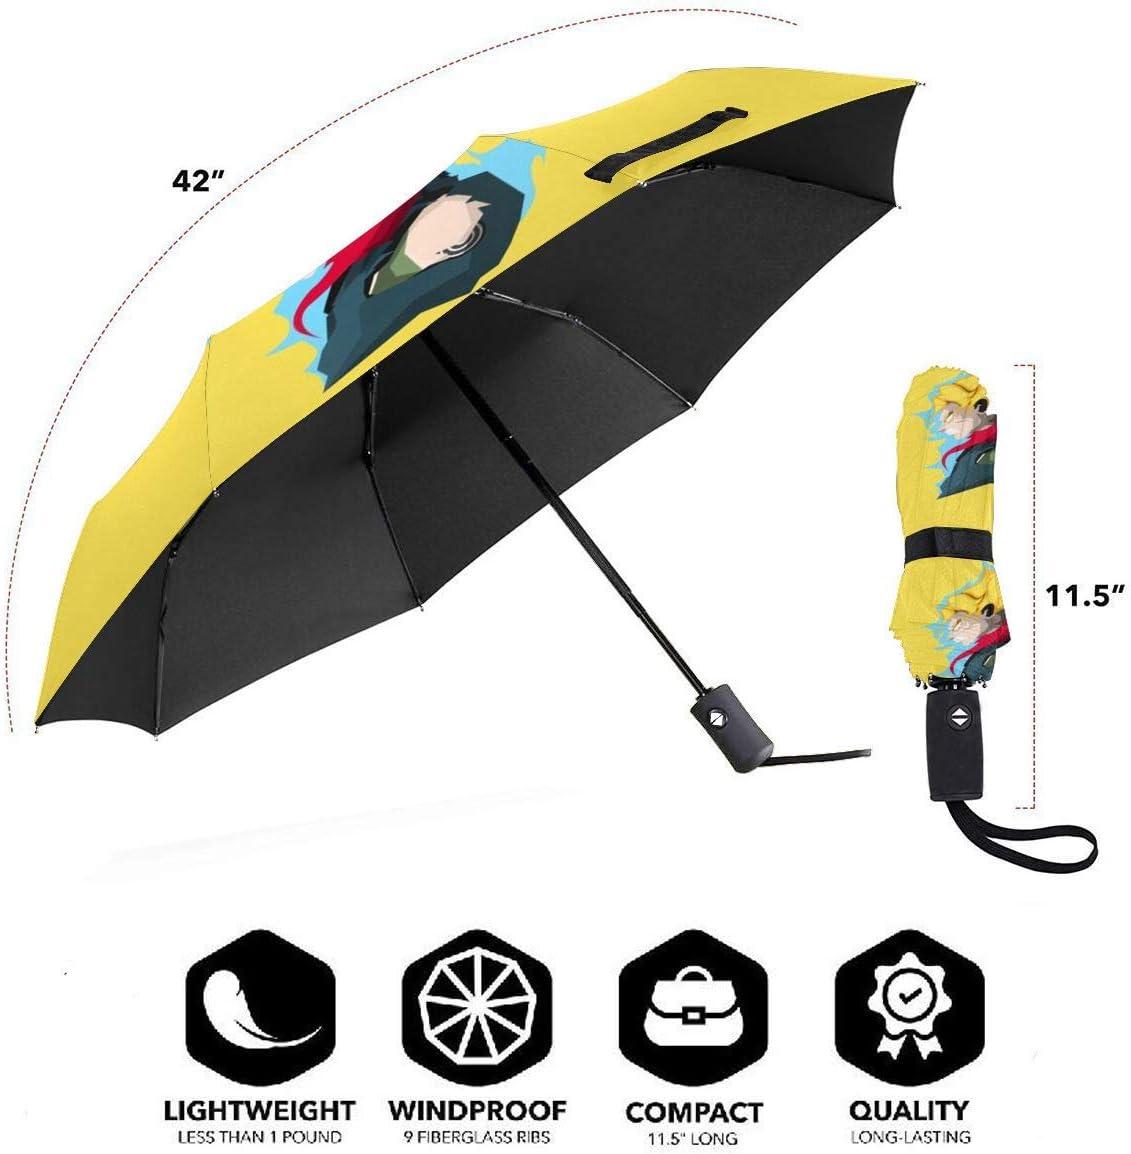 Windproof Travel Umbrella Son Goku Dragon Ball Super Compact Folding Umbrella Automatic Open//Close